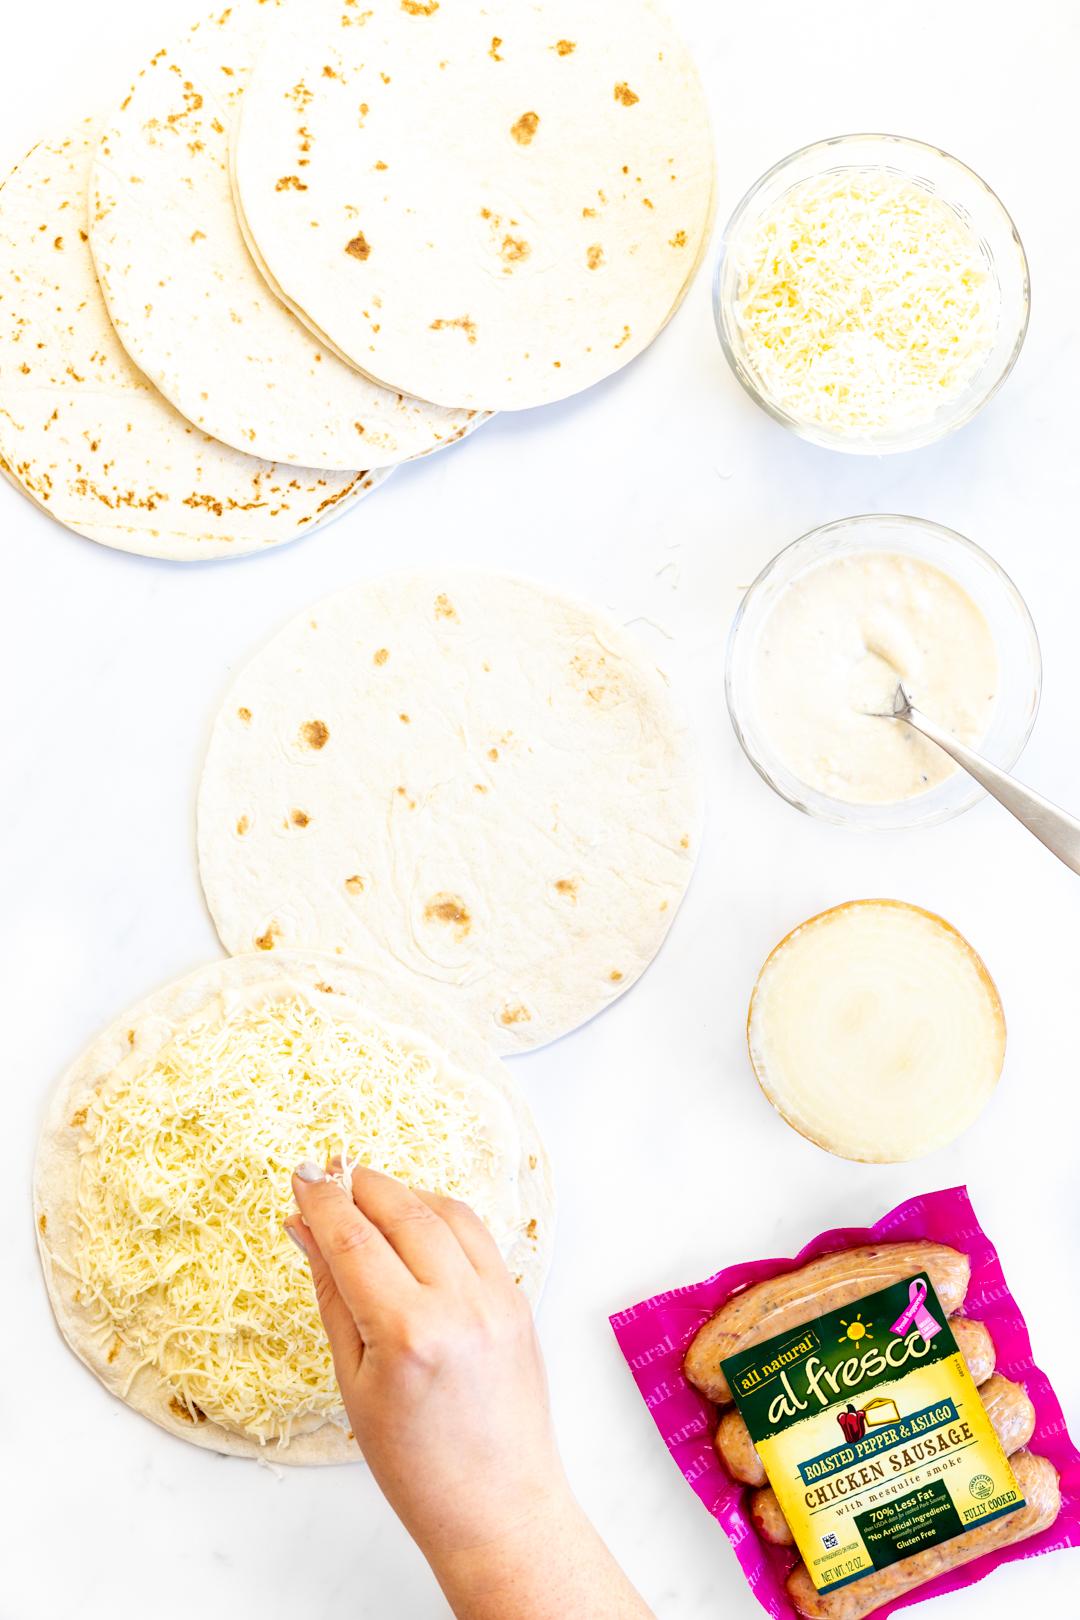 adding cheese to quesadillas